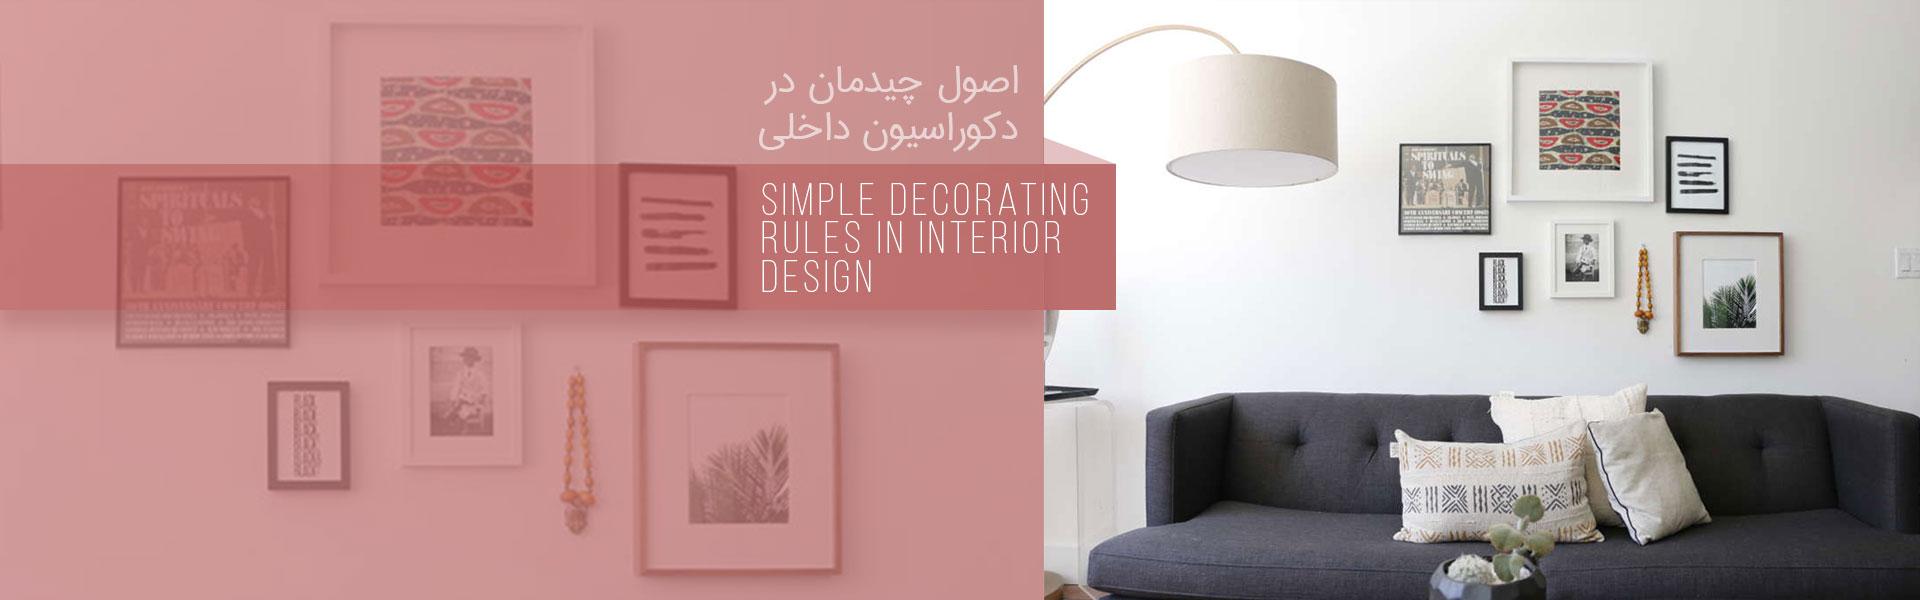 decorasion osul chideman - اصول چیدمان در دکوراسیون داخلی